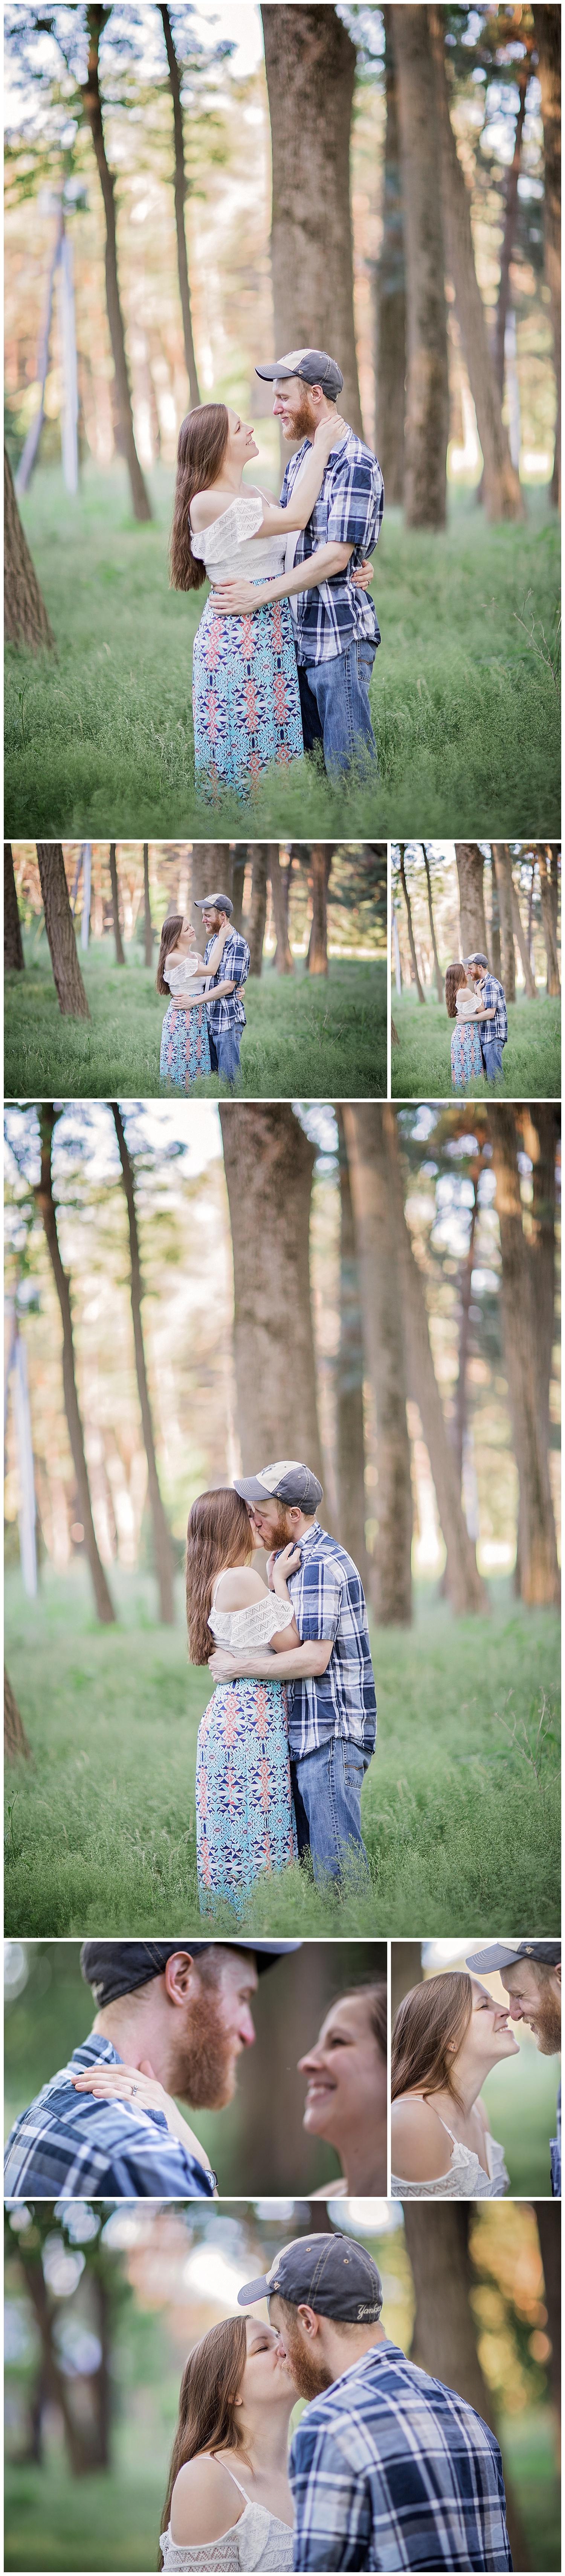 M & B - Letchworth state park - Lass & Beau-151_Buffalo wedding photography.jpg